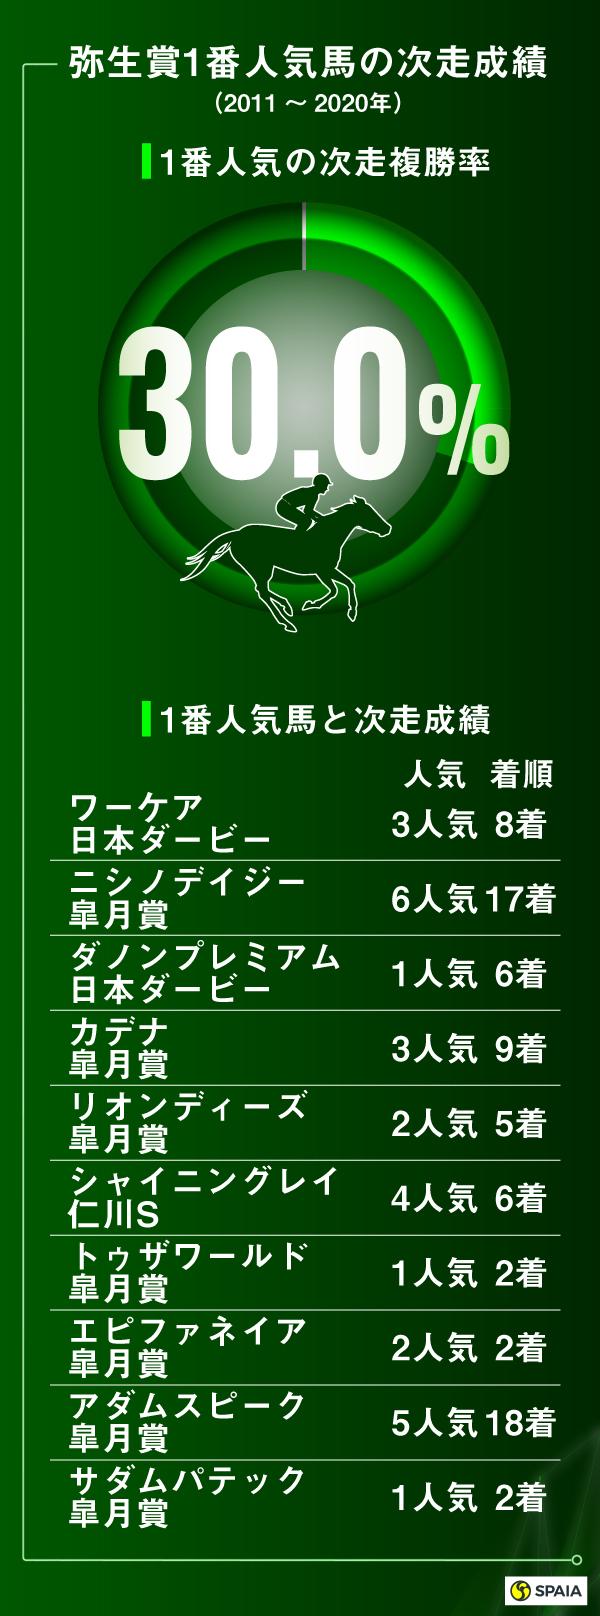 弥生賞1番人気馬の成績 2011~2020年ⒸSPAIA